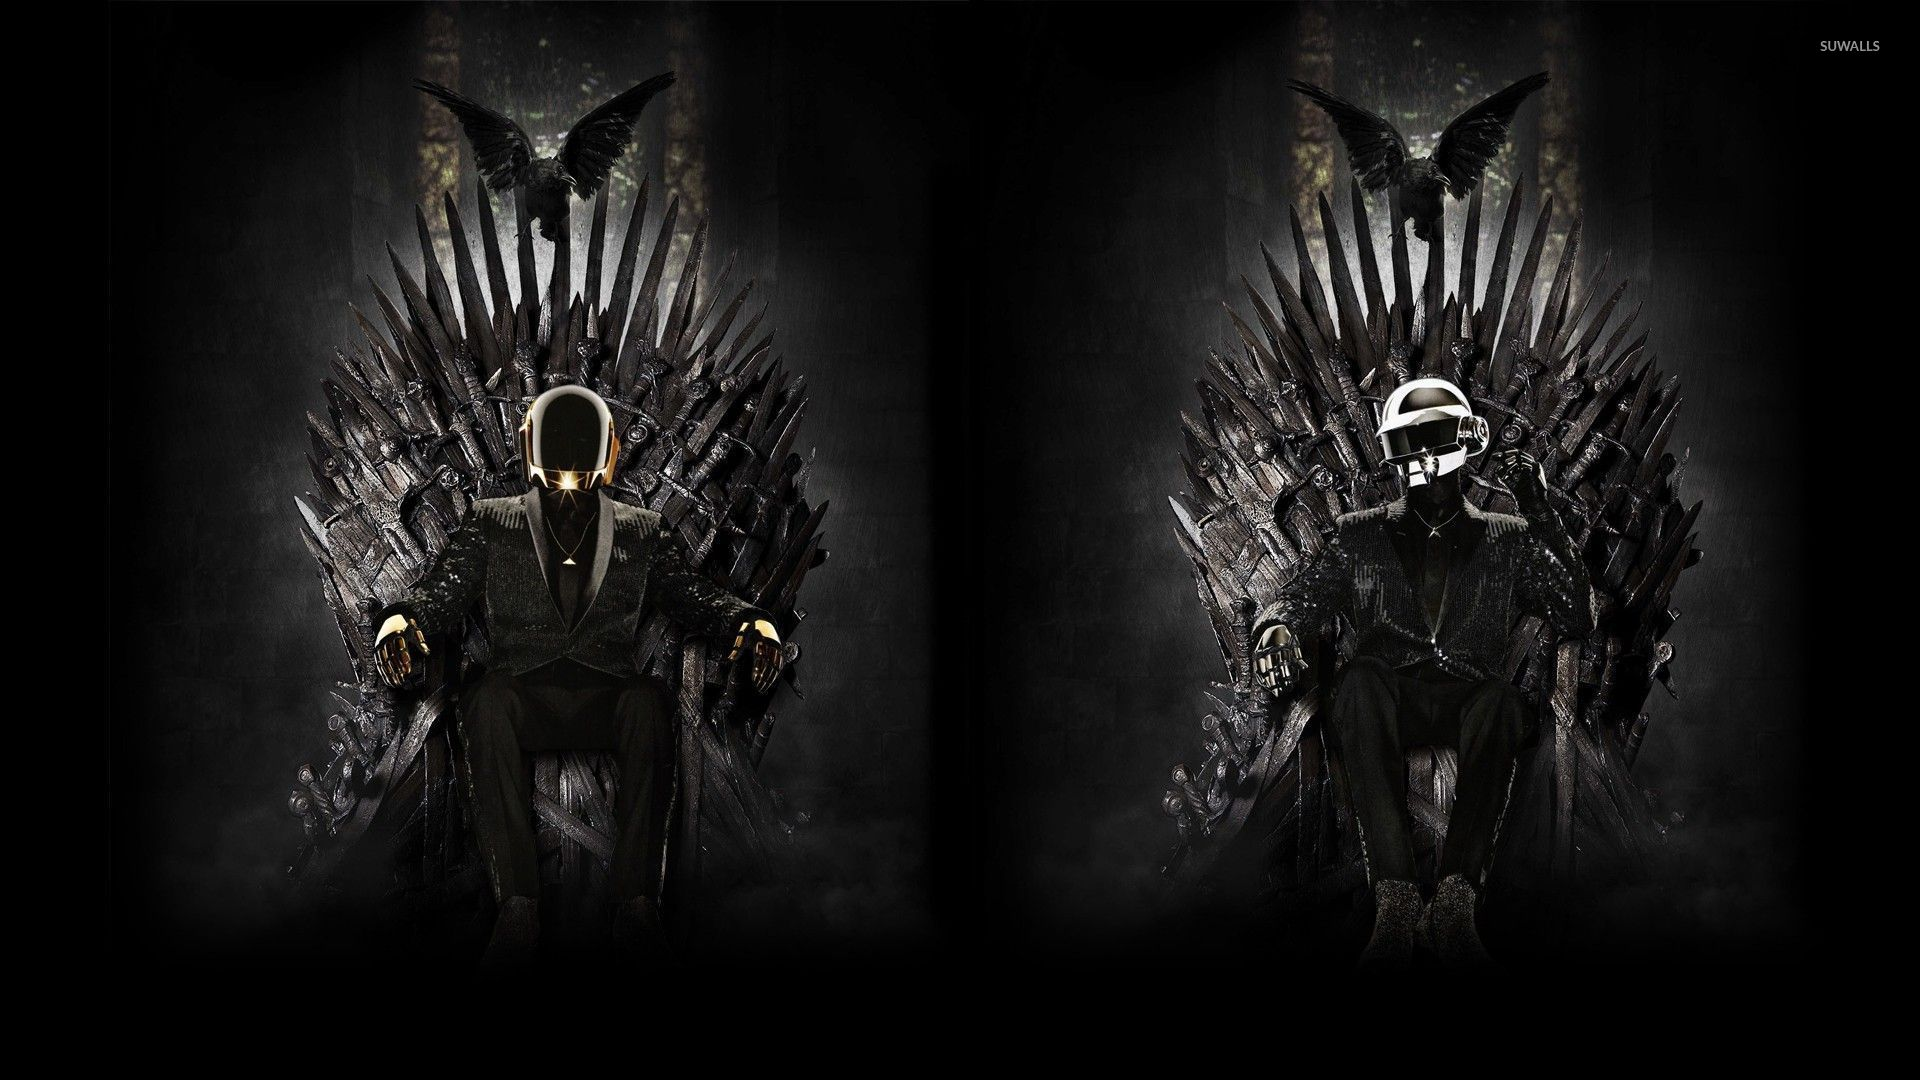 27 The Iron Throne Wallpaper On Wallpapersafari